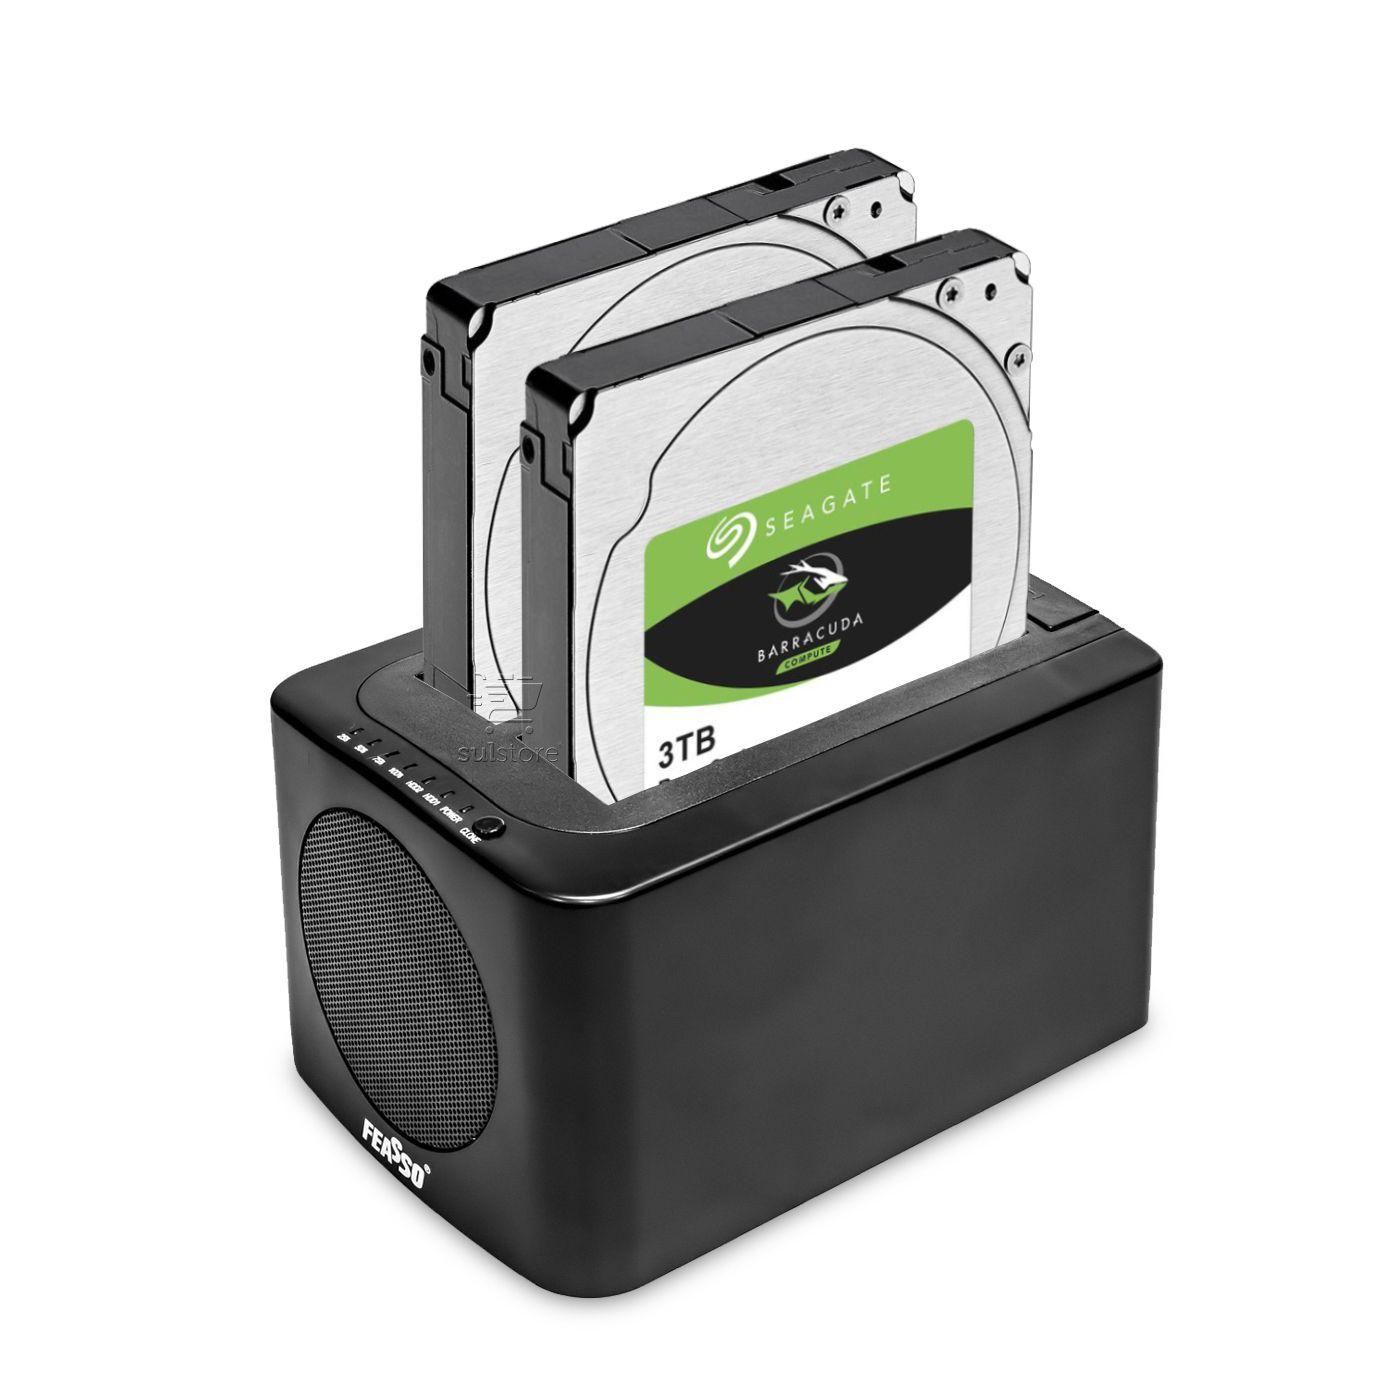 Dock Station Para HD SSD Sata 3 USB 3.0 Clone FAHD-35 Feasso Com Cooler